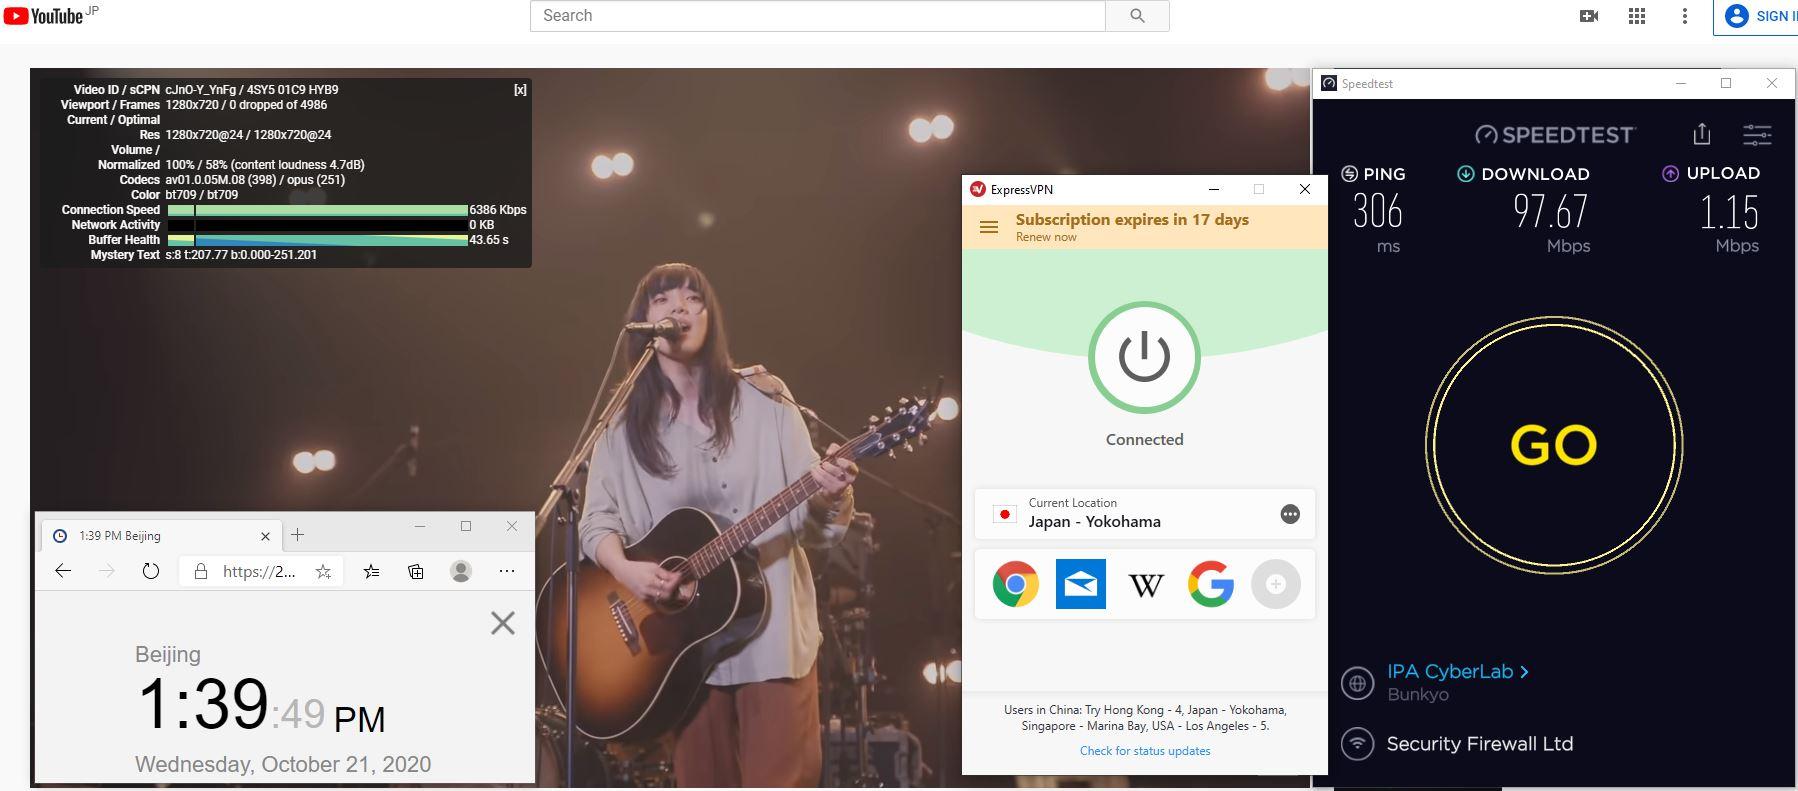 Windows10 ExpressVPN Automatic Japan- Yokohama 服务器 中国VPN 翻墙 科学上网 翻墙速度测试 - 20201021